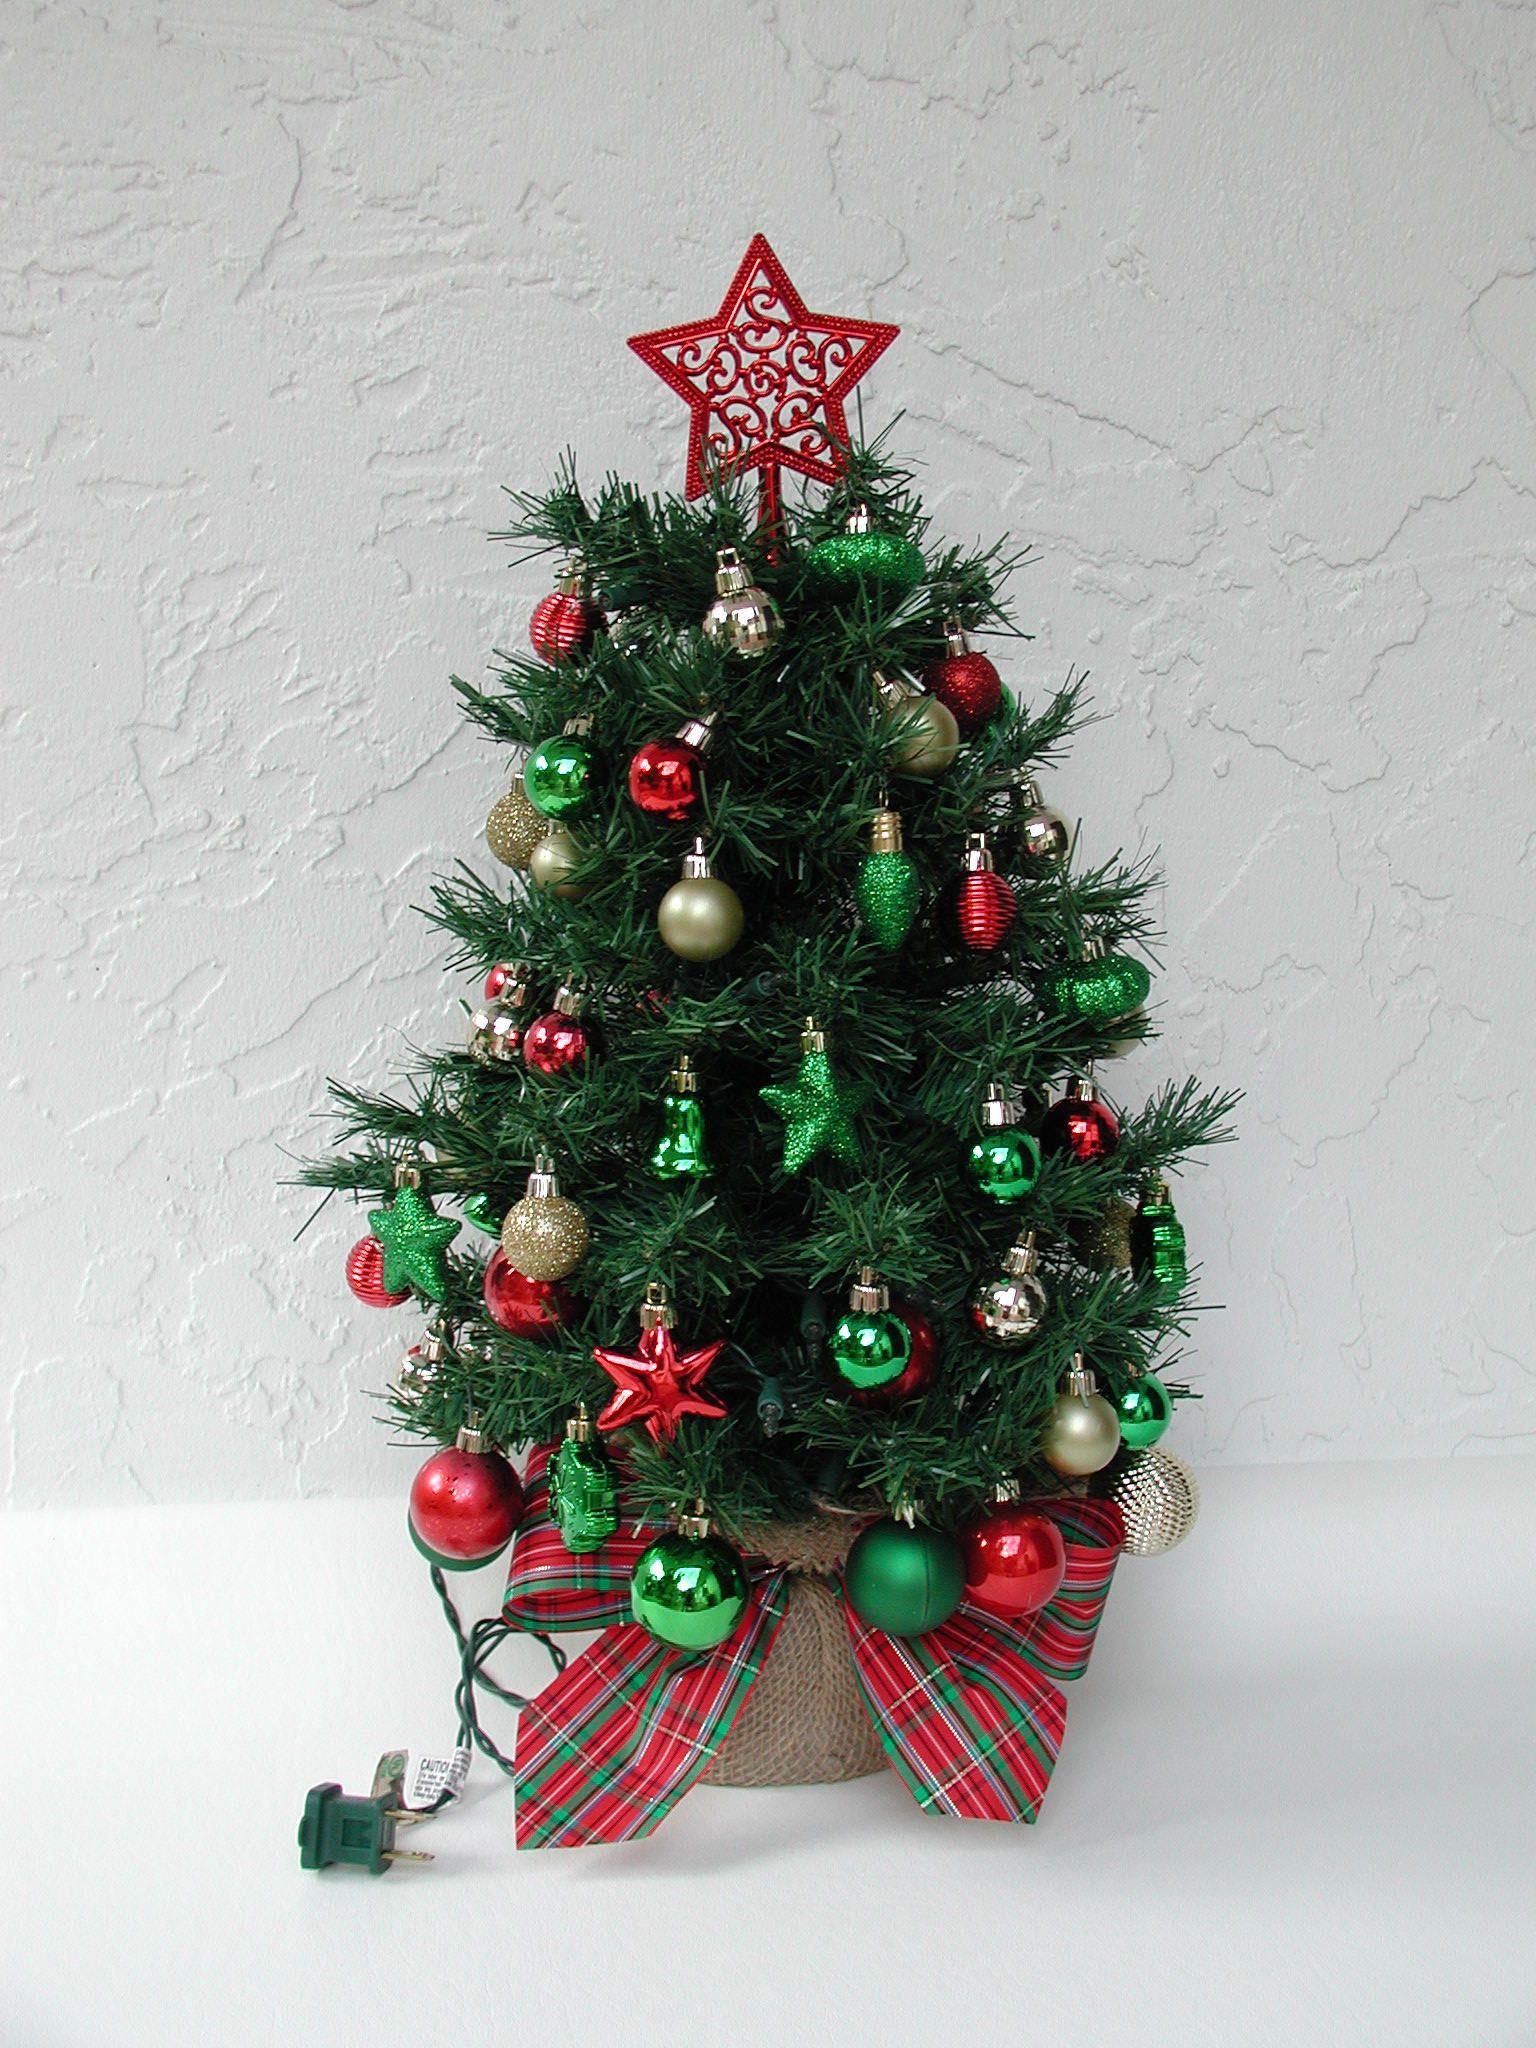 Miniature Christmas Tree Fully Decorated Tree 50 Color Etsy Miniature Christmas Miniature Christmas Trees Small Christmas Trees Decorated